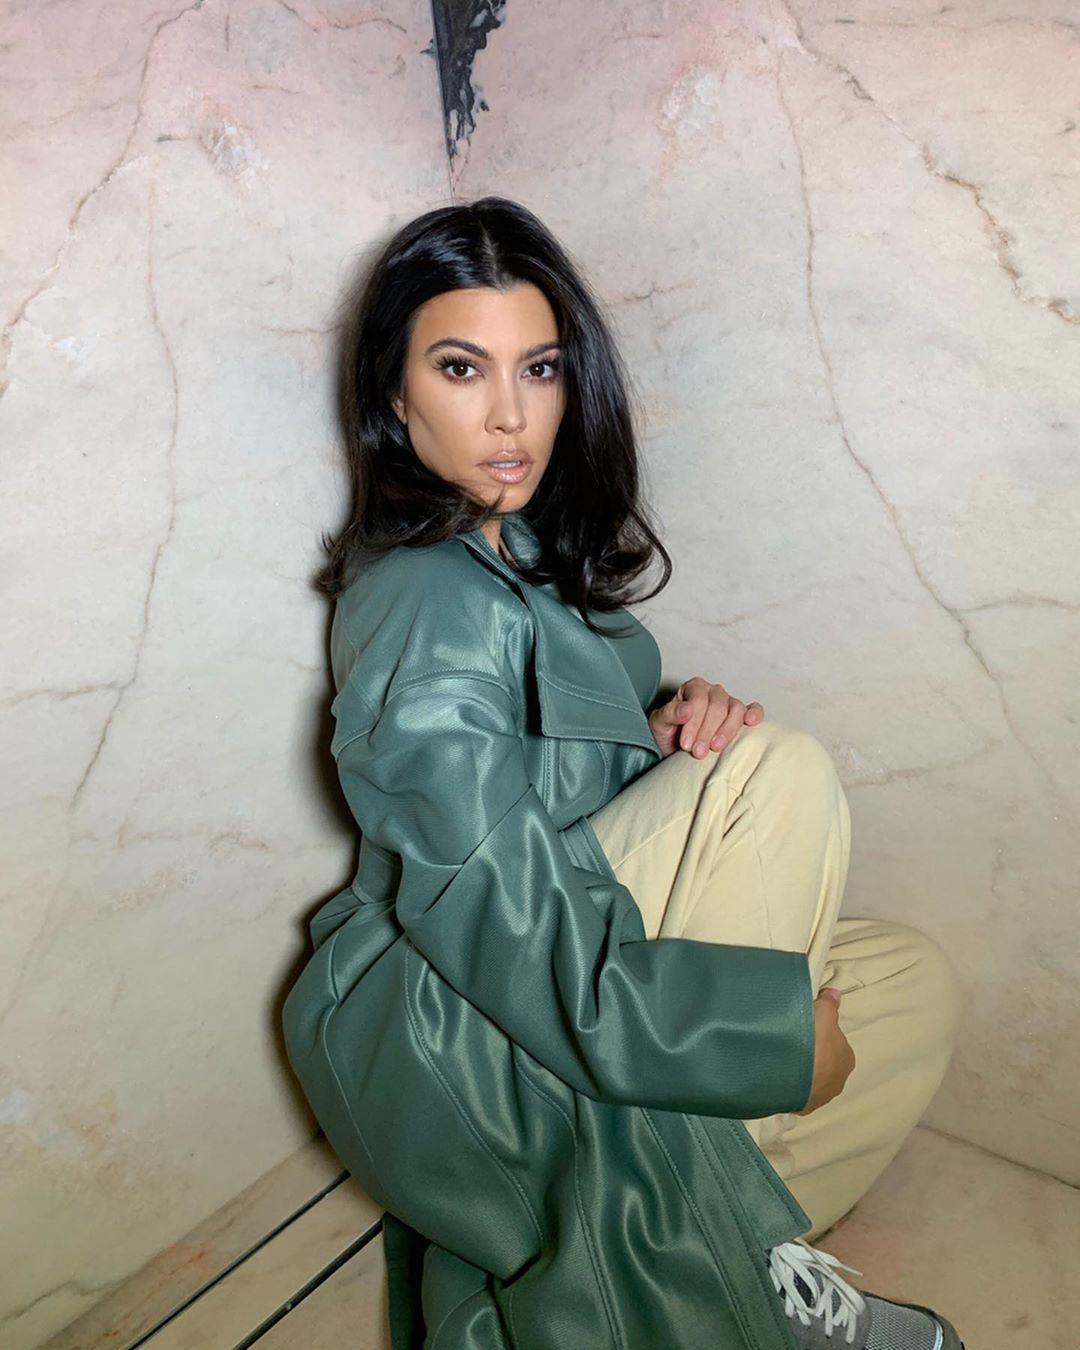 Kourtney Kardashian rocking Baggy cream cotton Pangaia sweatpants with a cotton fabric